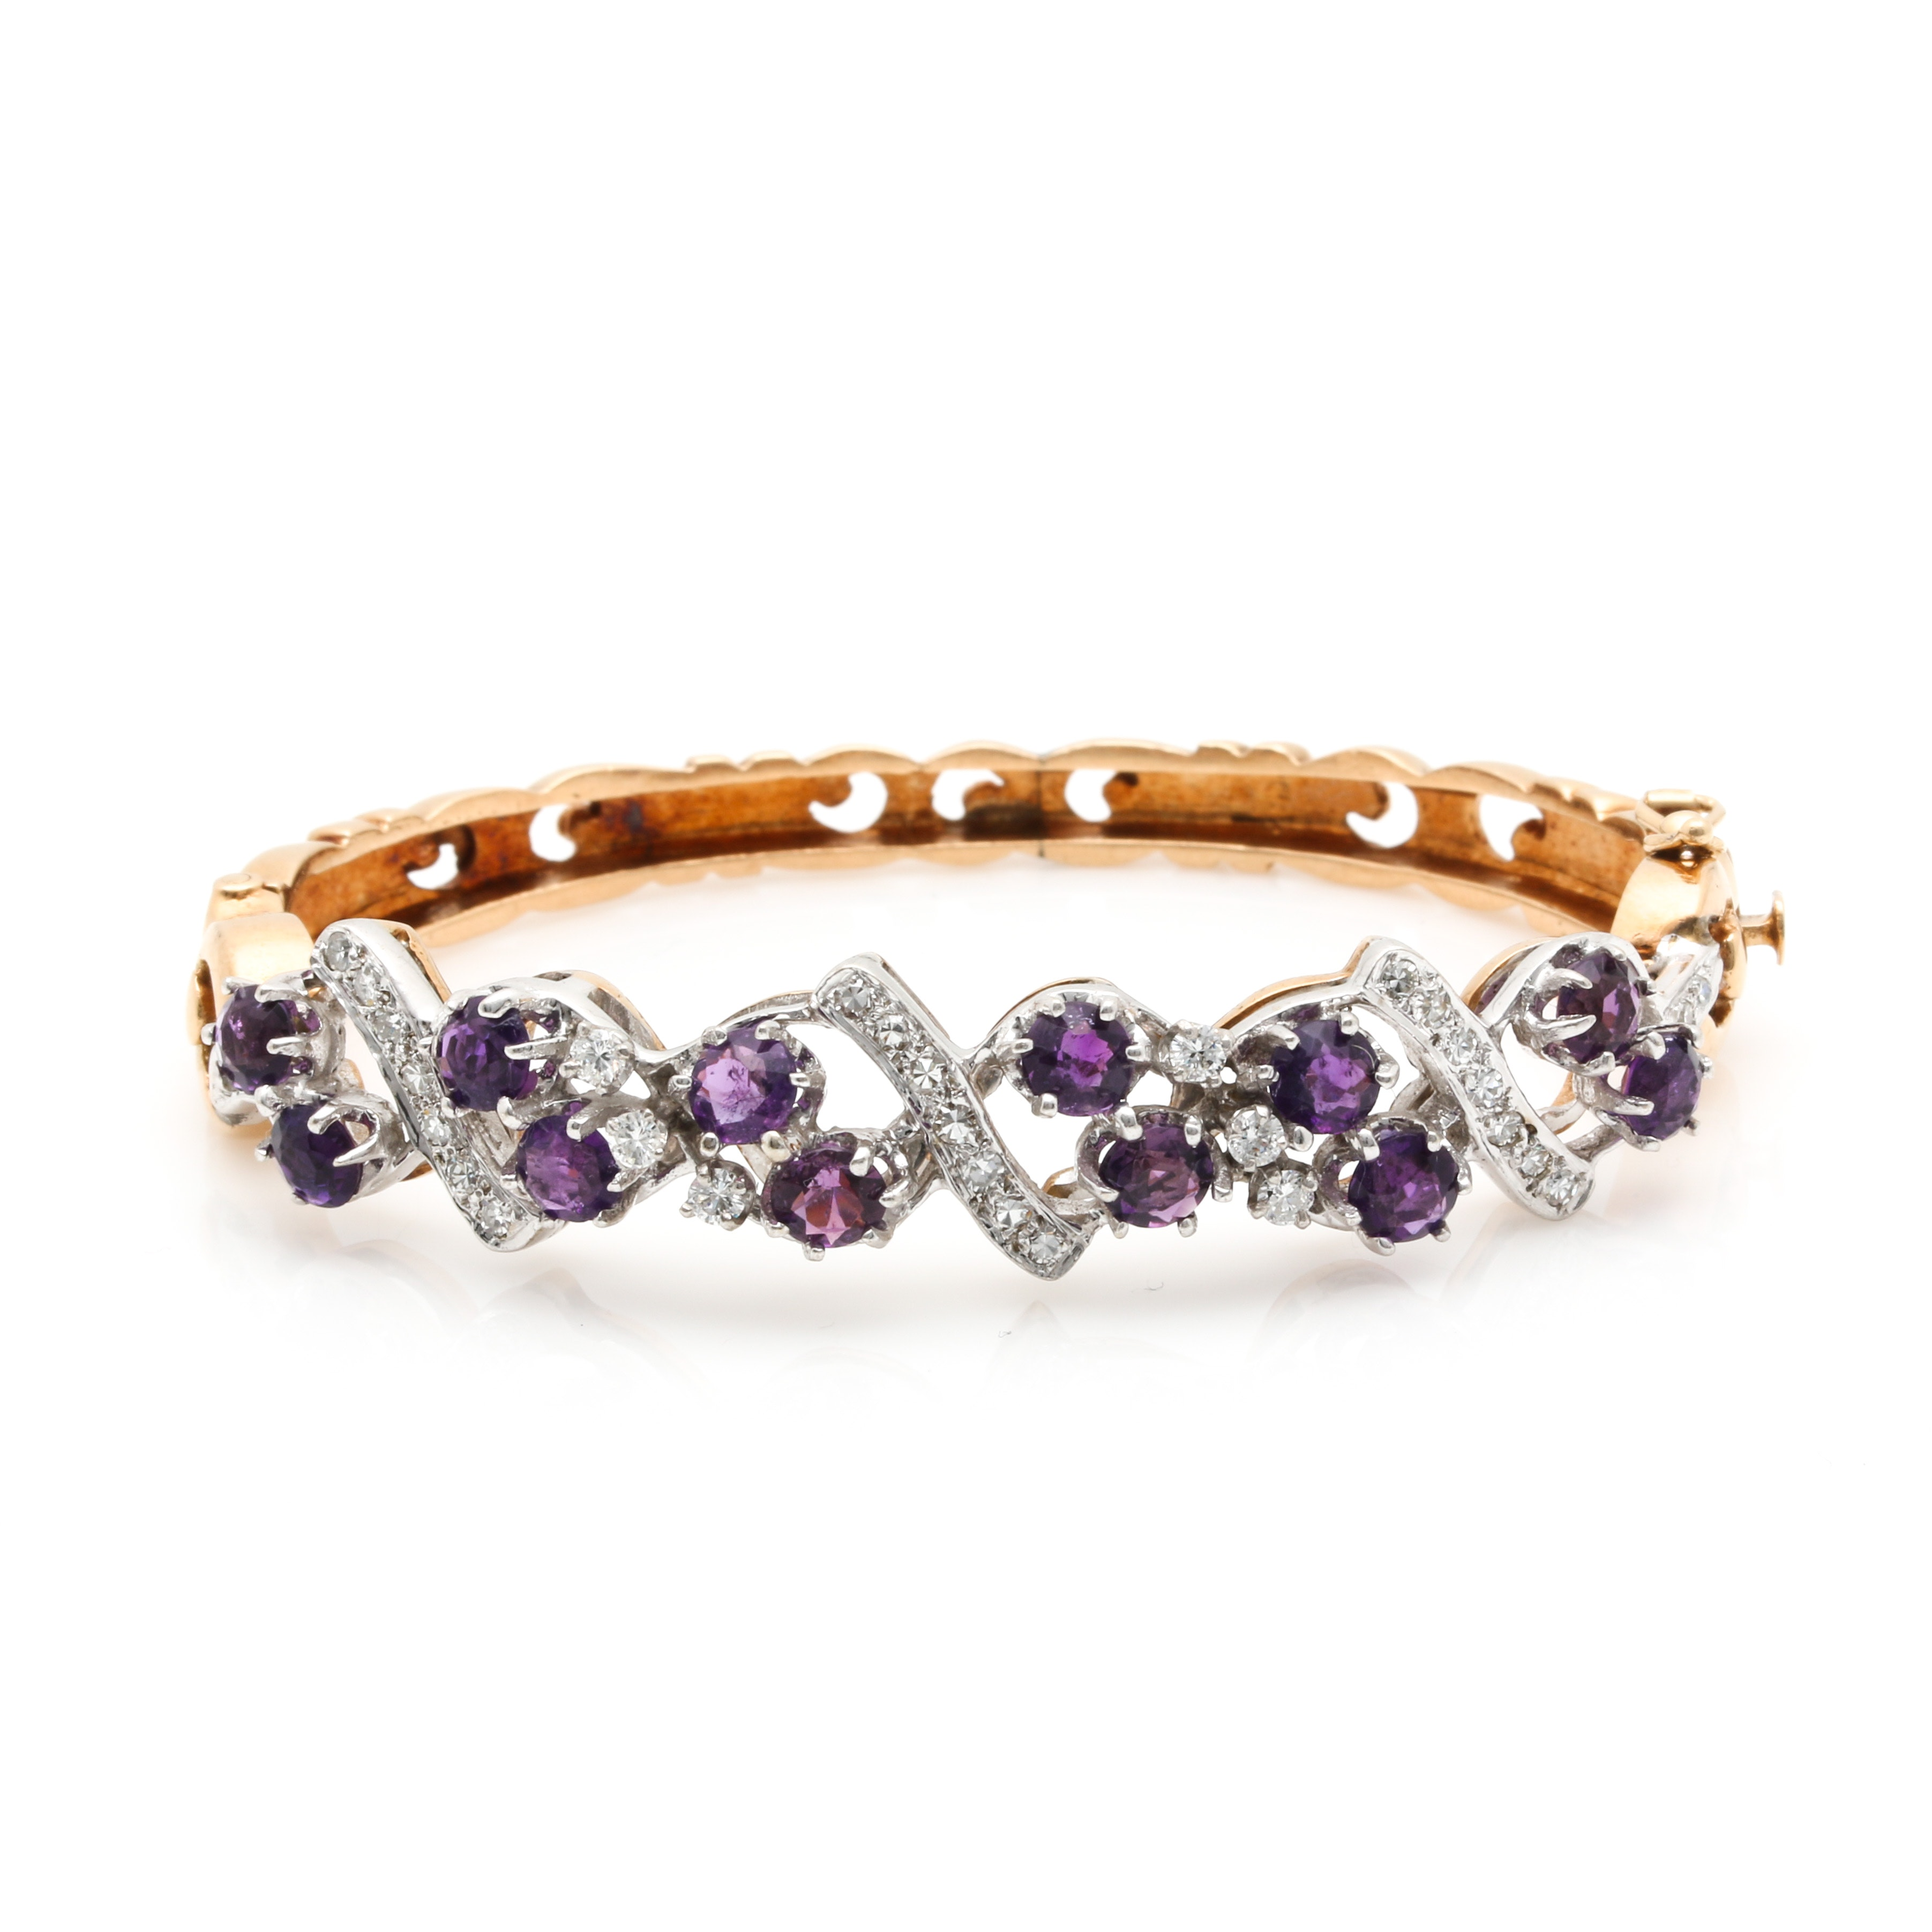 14K Bi-Color Hinged 3.50 CTW Amethyst and Diamond Bracelet